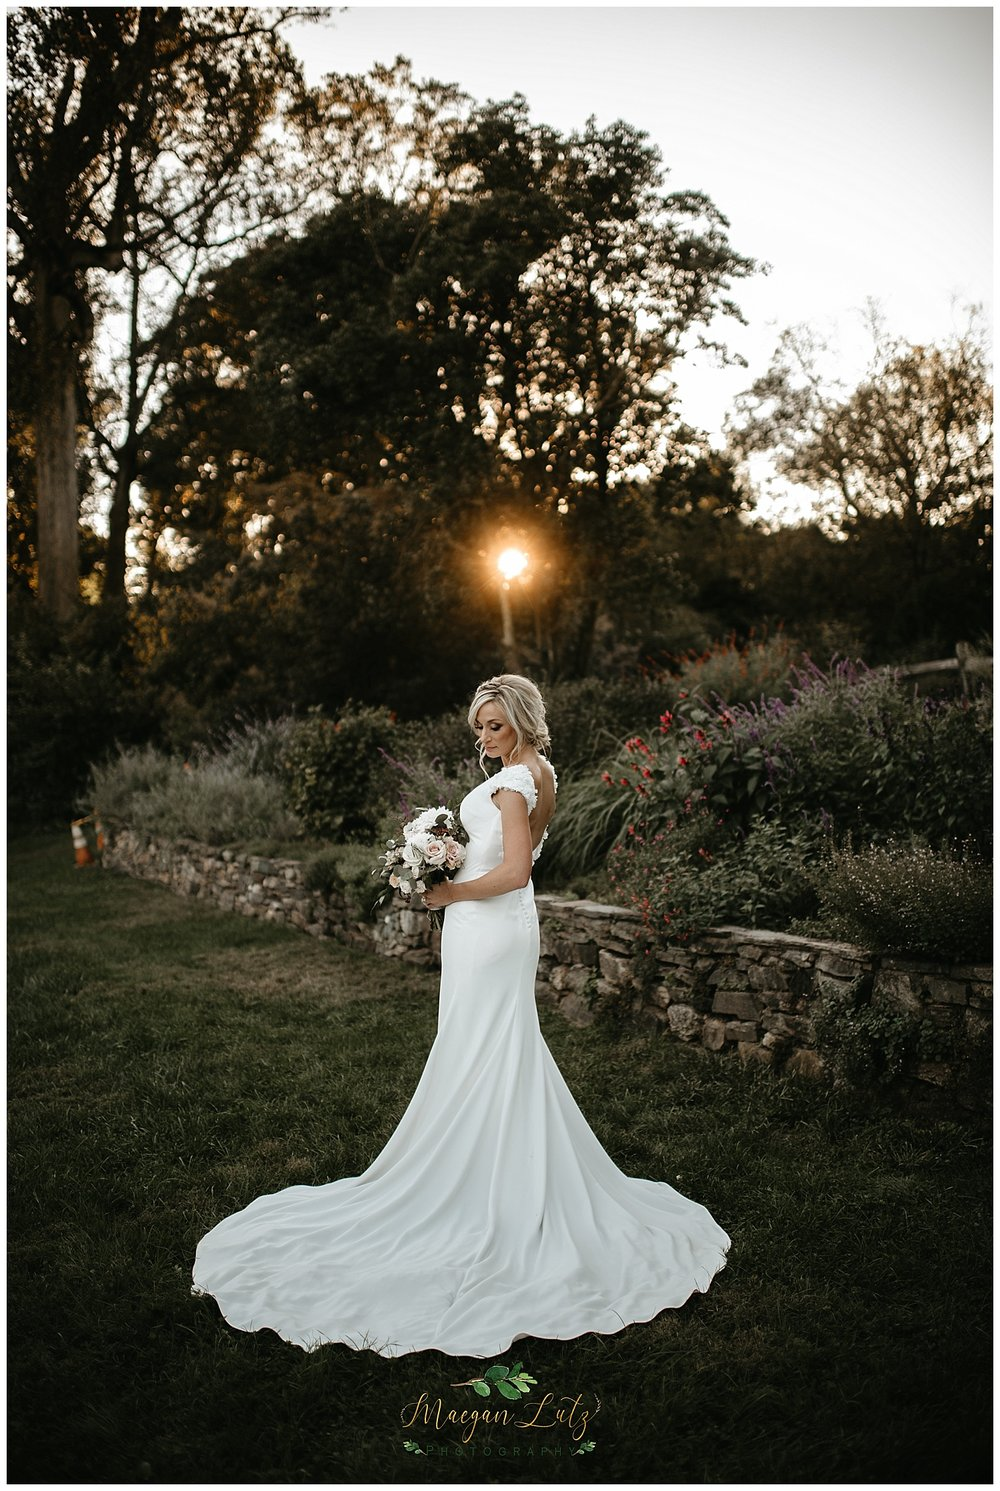 NEPA-wedding-photographer-at-Tyler-Arboretum-Media-PA_0029.jpg